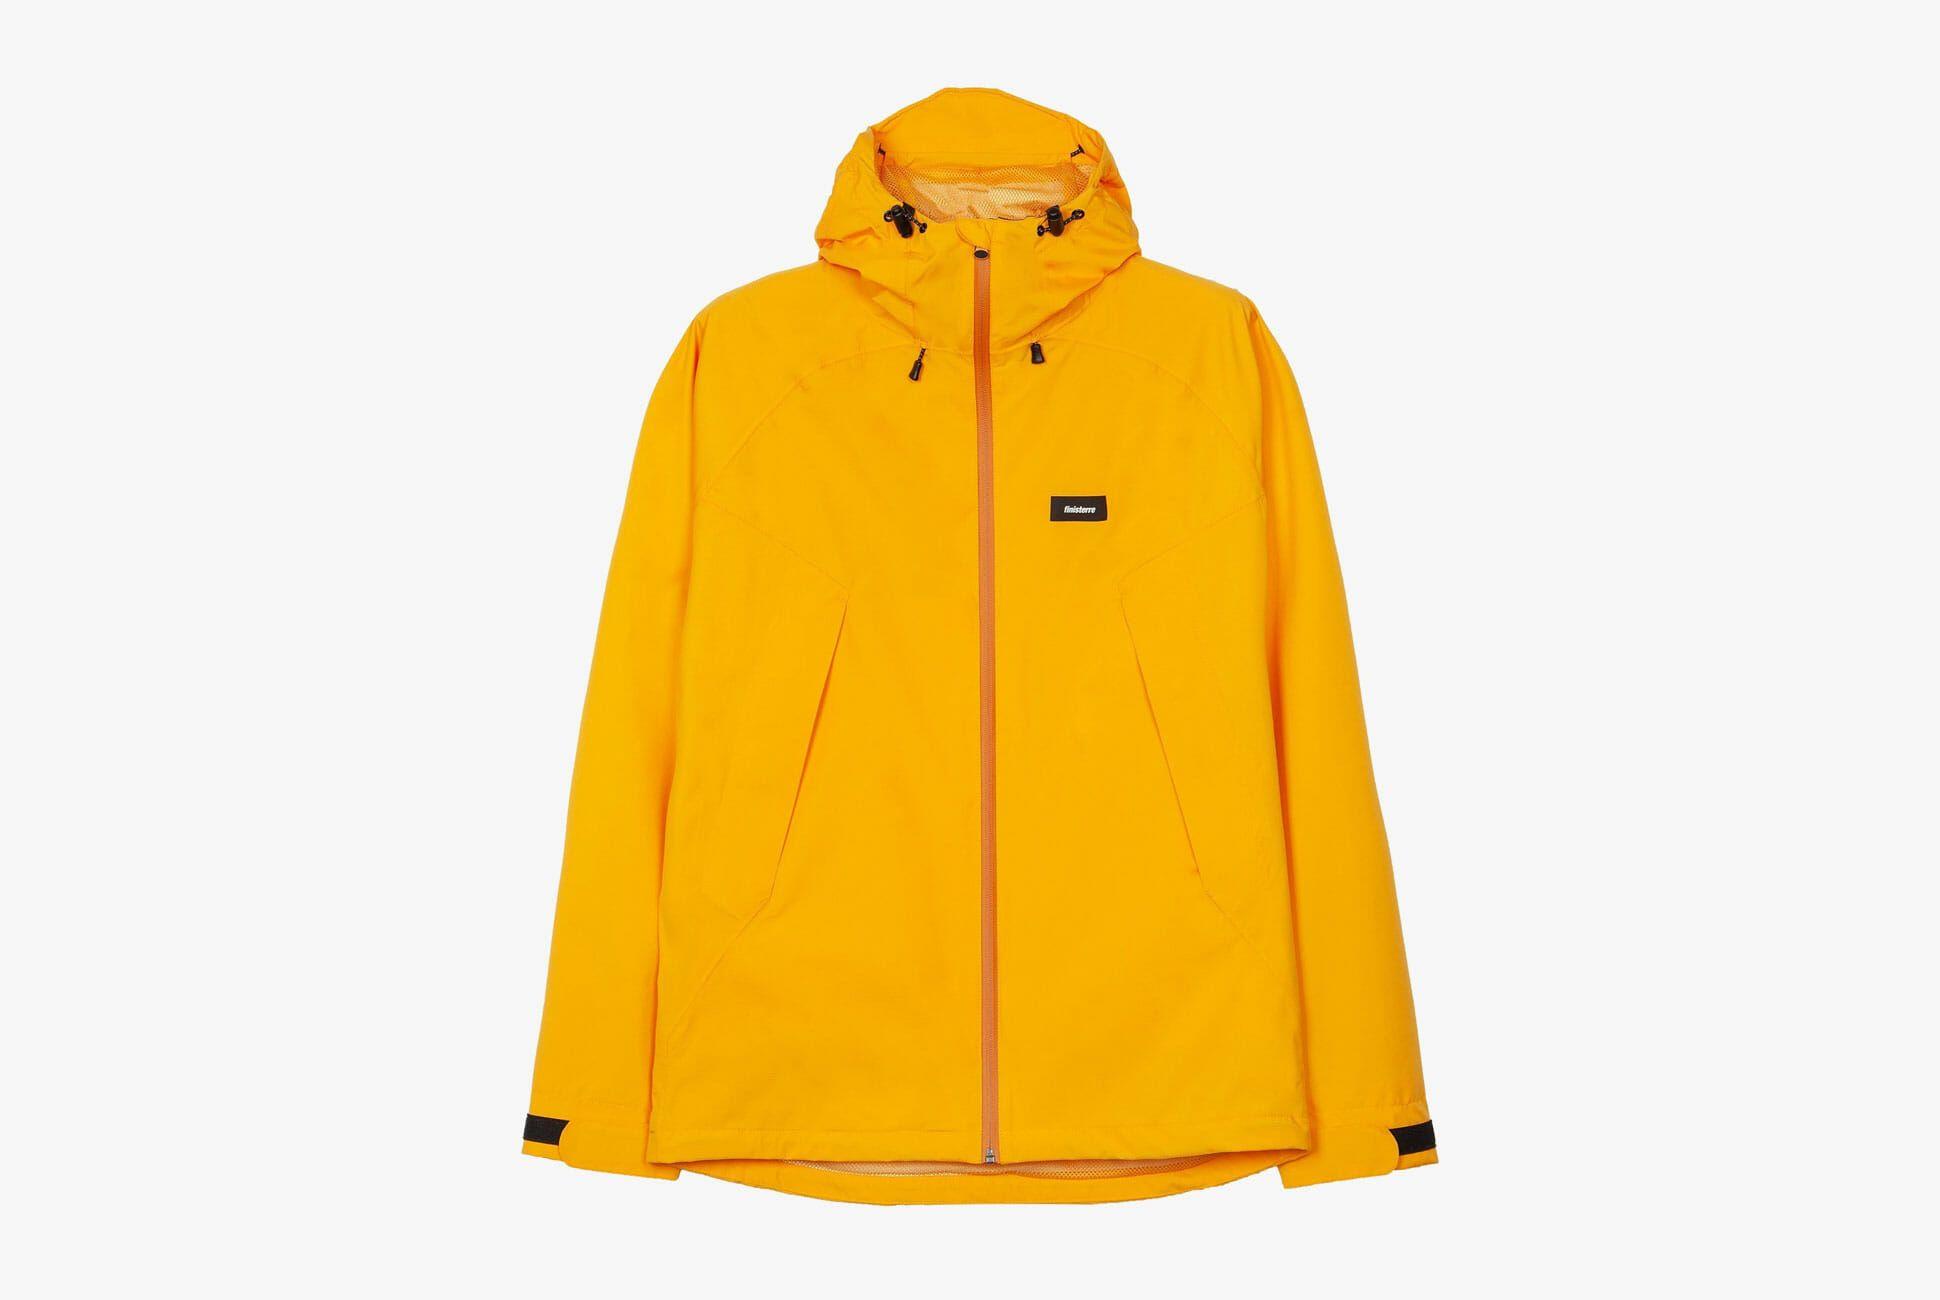 Finisterre-Summer-Collection-gear-patrol-waterproof-jacket